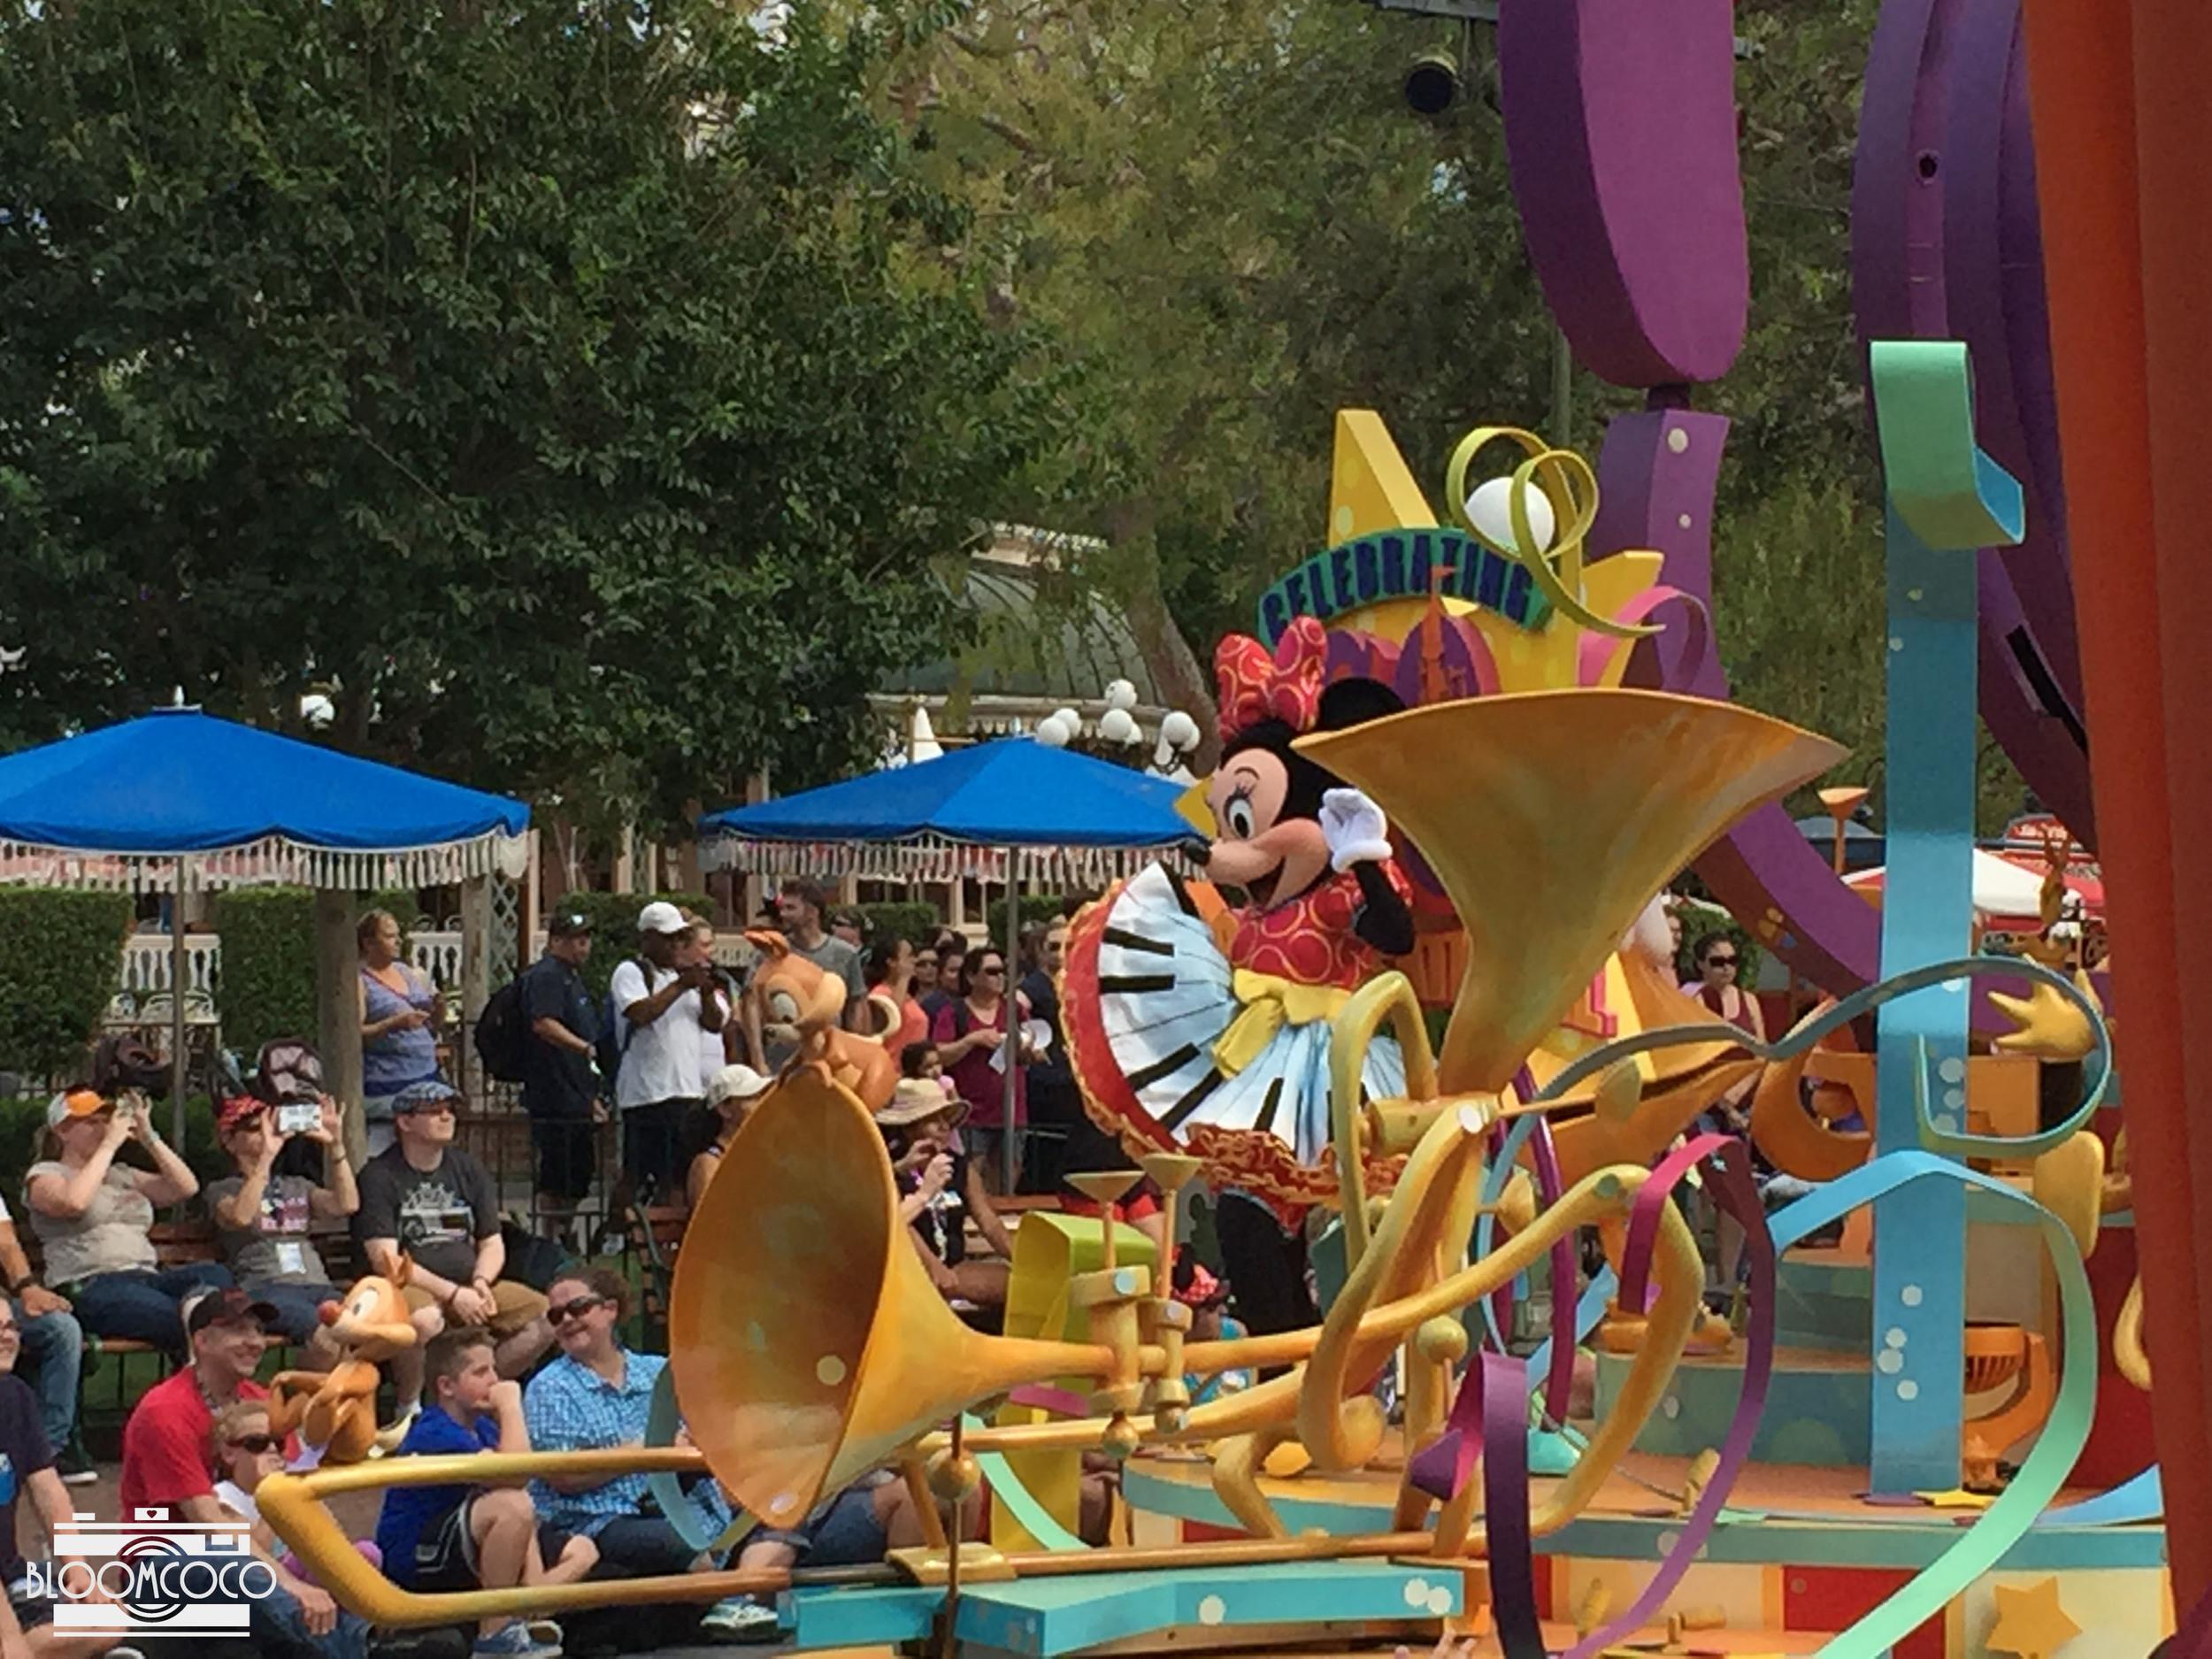 DisneyLandMickey'sHalloweenParty4.jpg